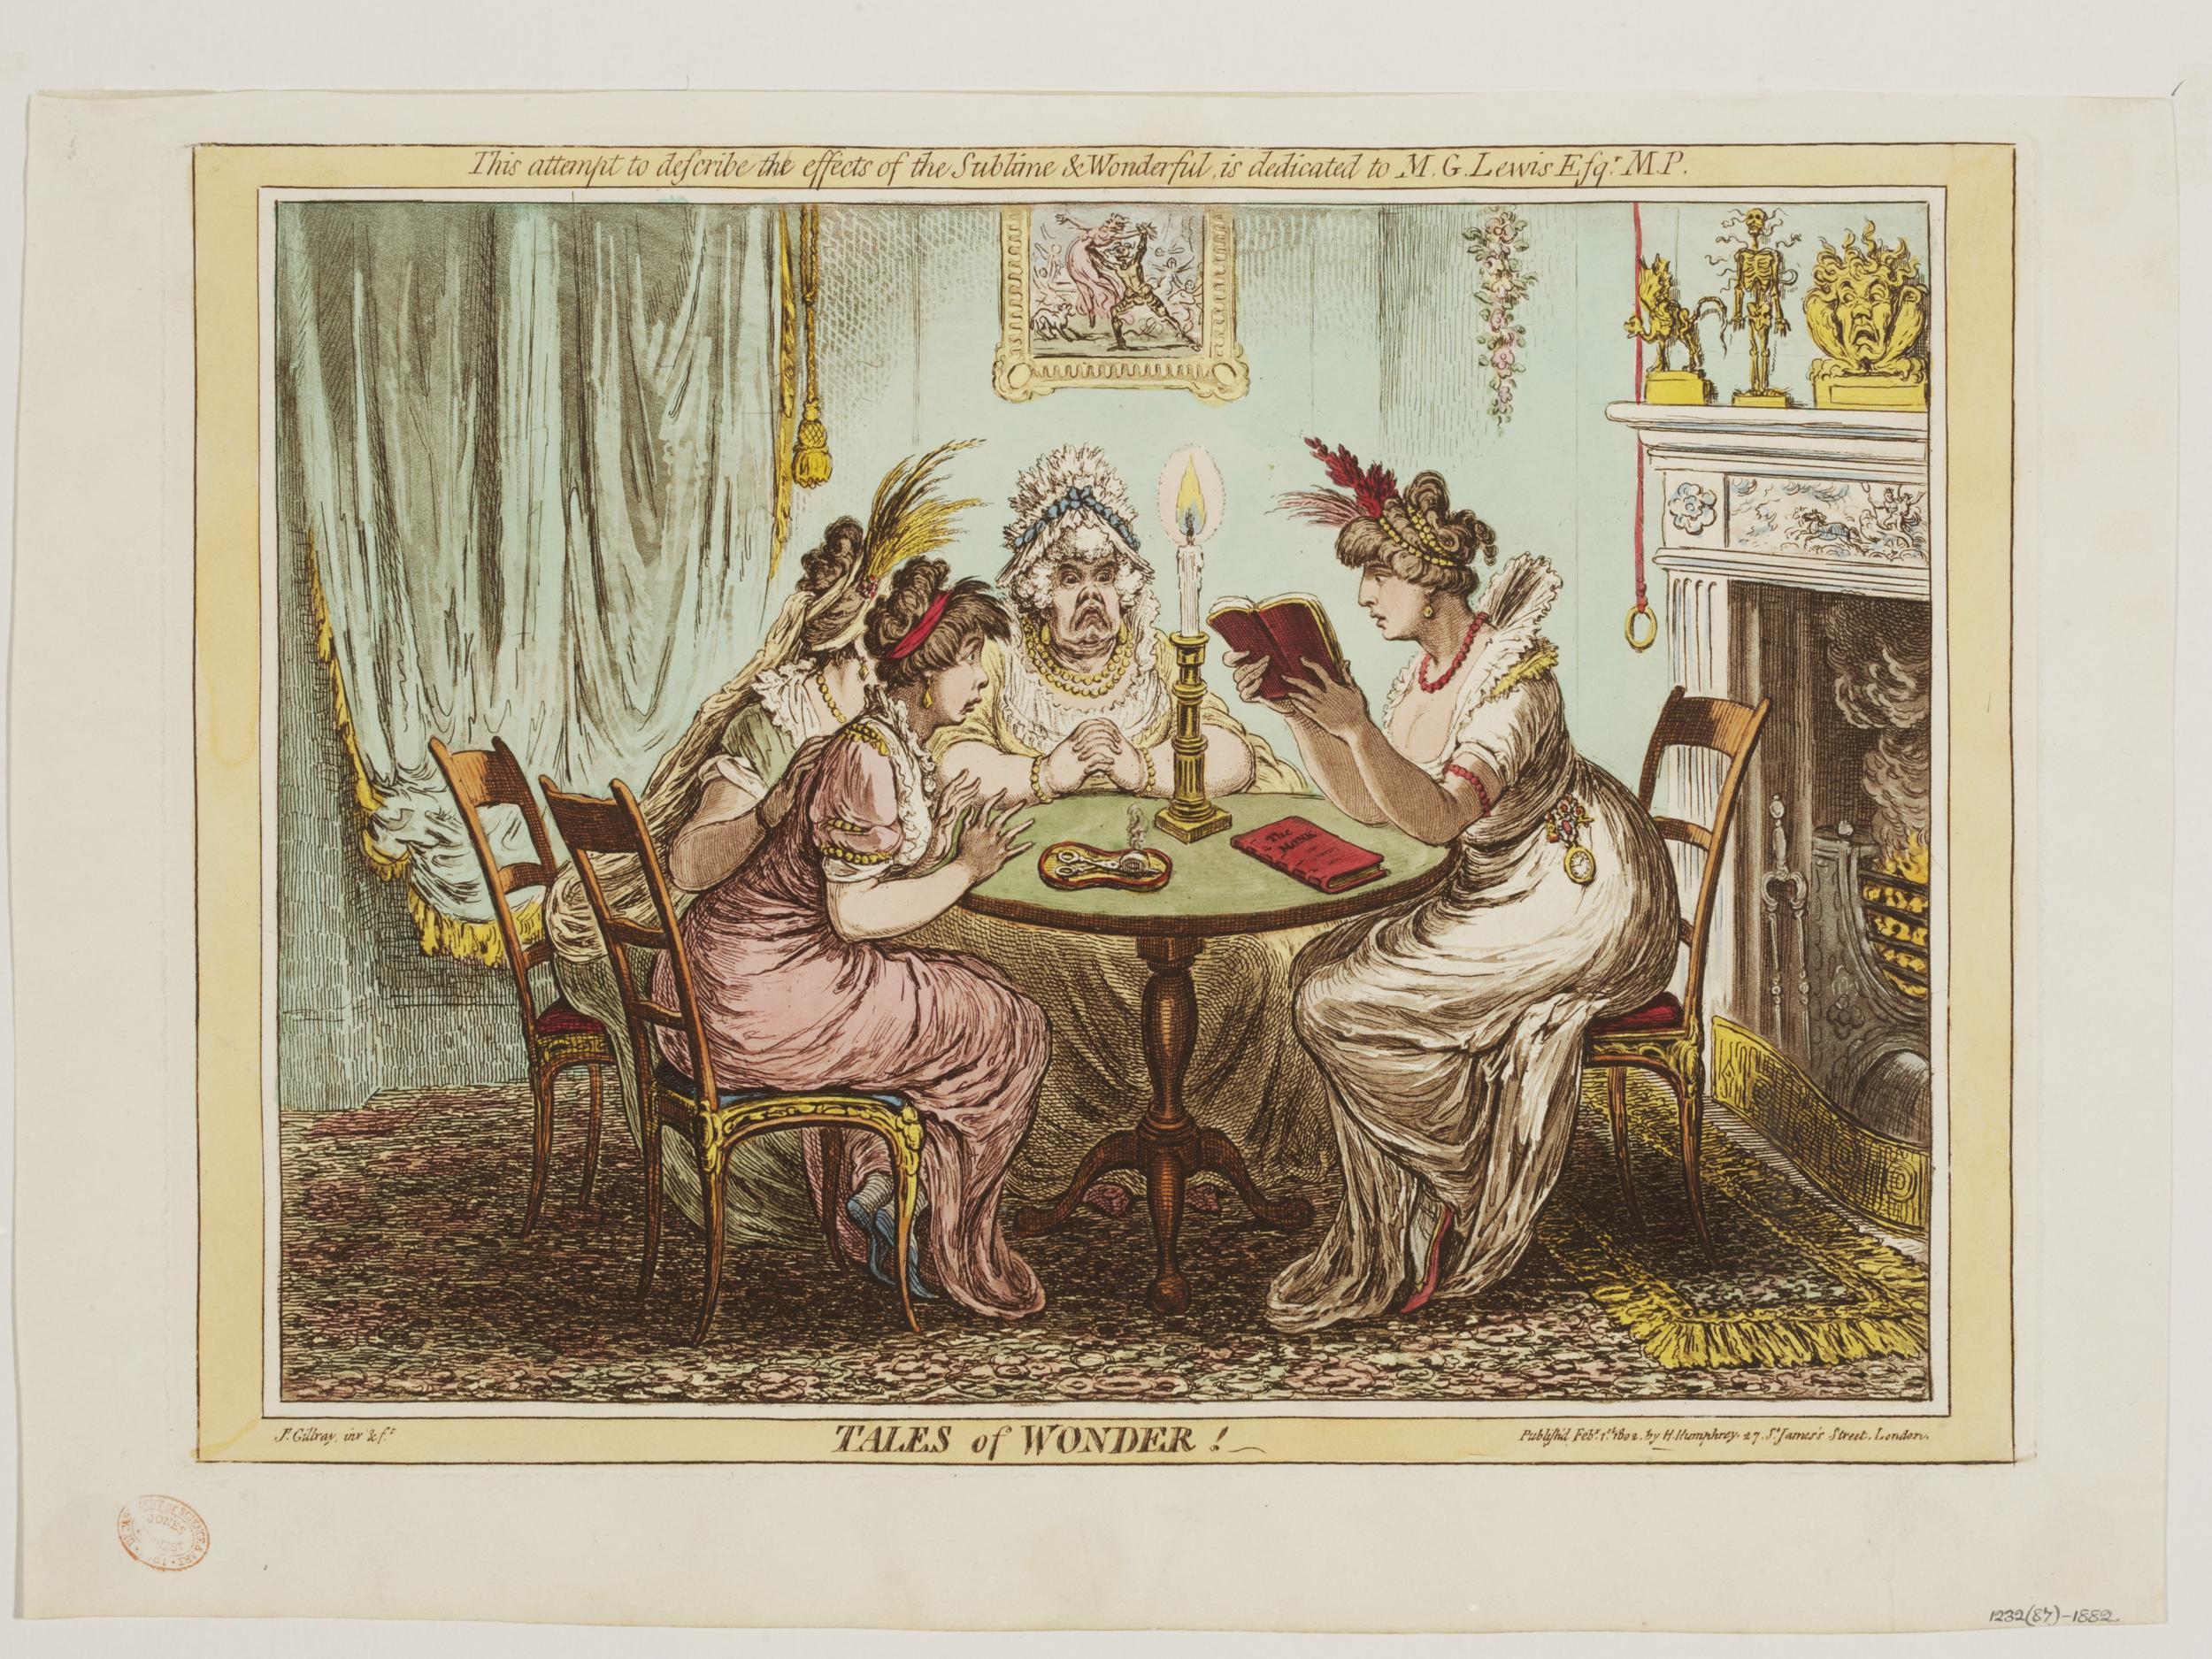 Image of ladies reading a gothic novel